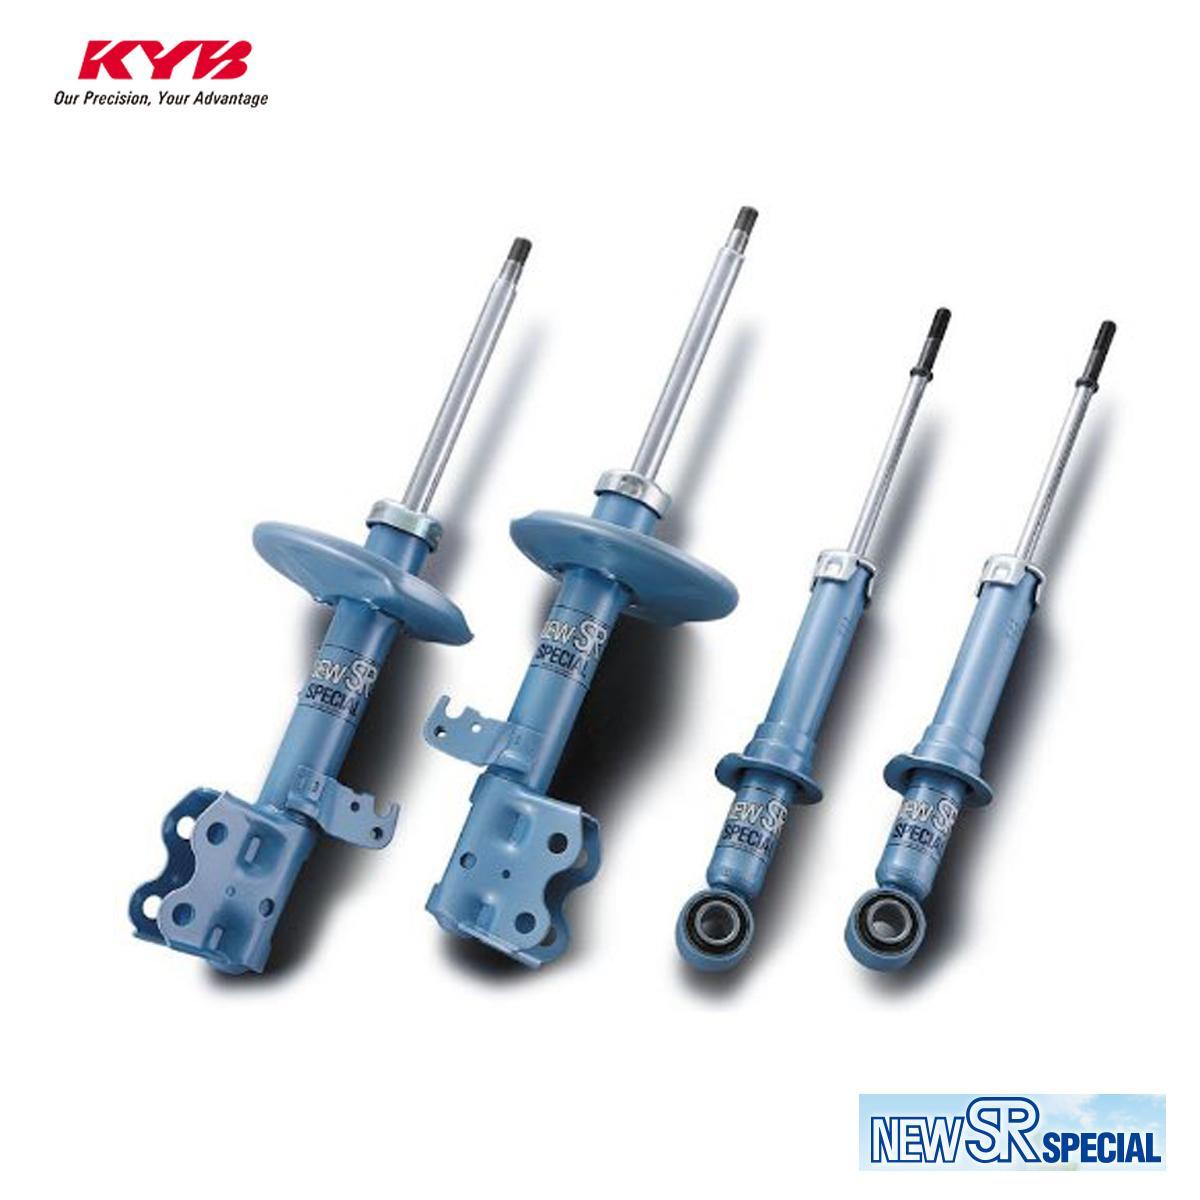 KYB カヤバ ローレル GC32/KGC32 ショックアブソーバー フロント用 1本 NEW SR SPECIAL NSC4067 配送先条件有り